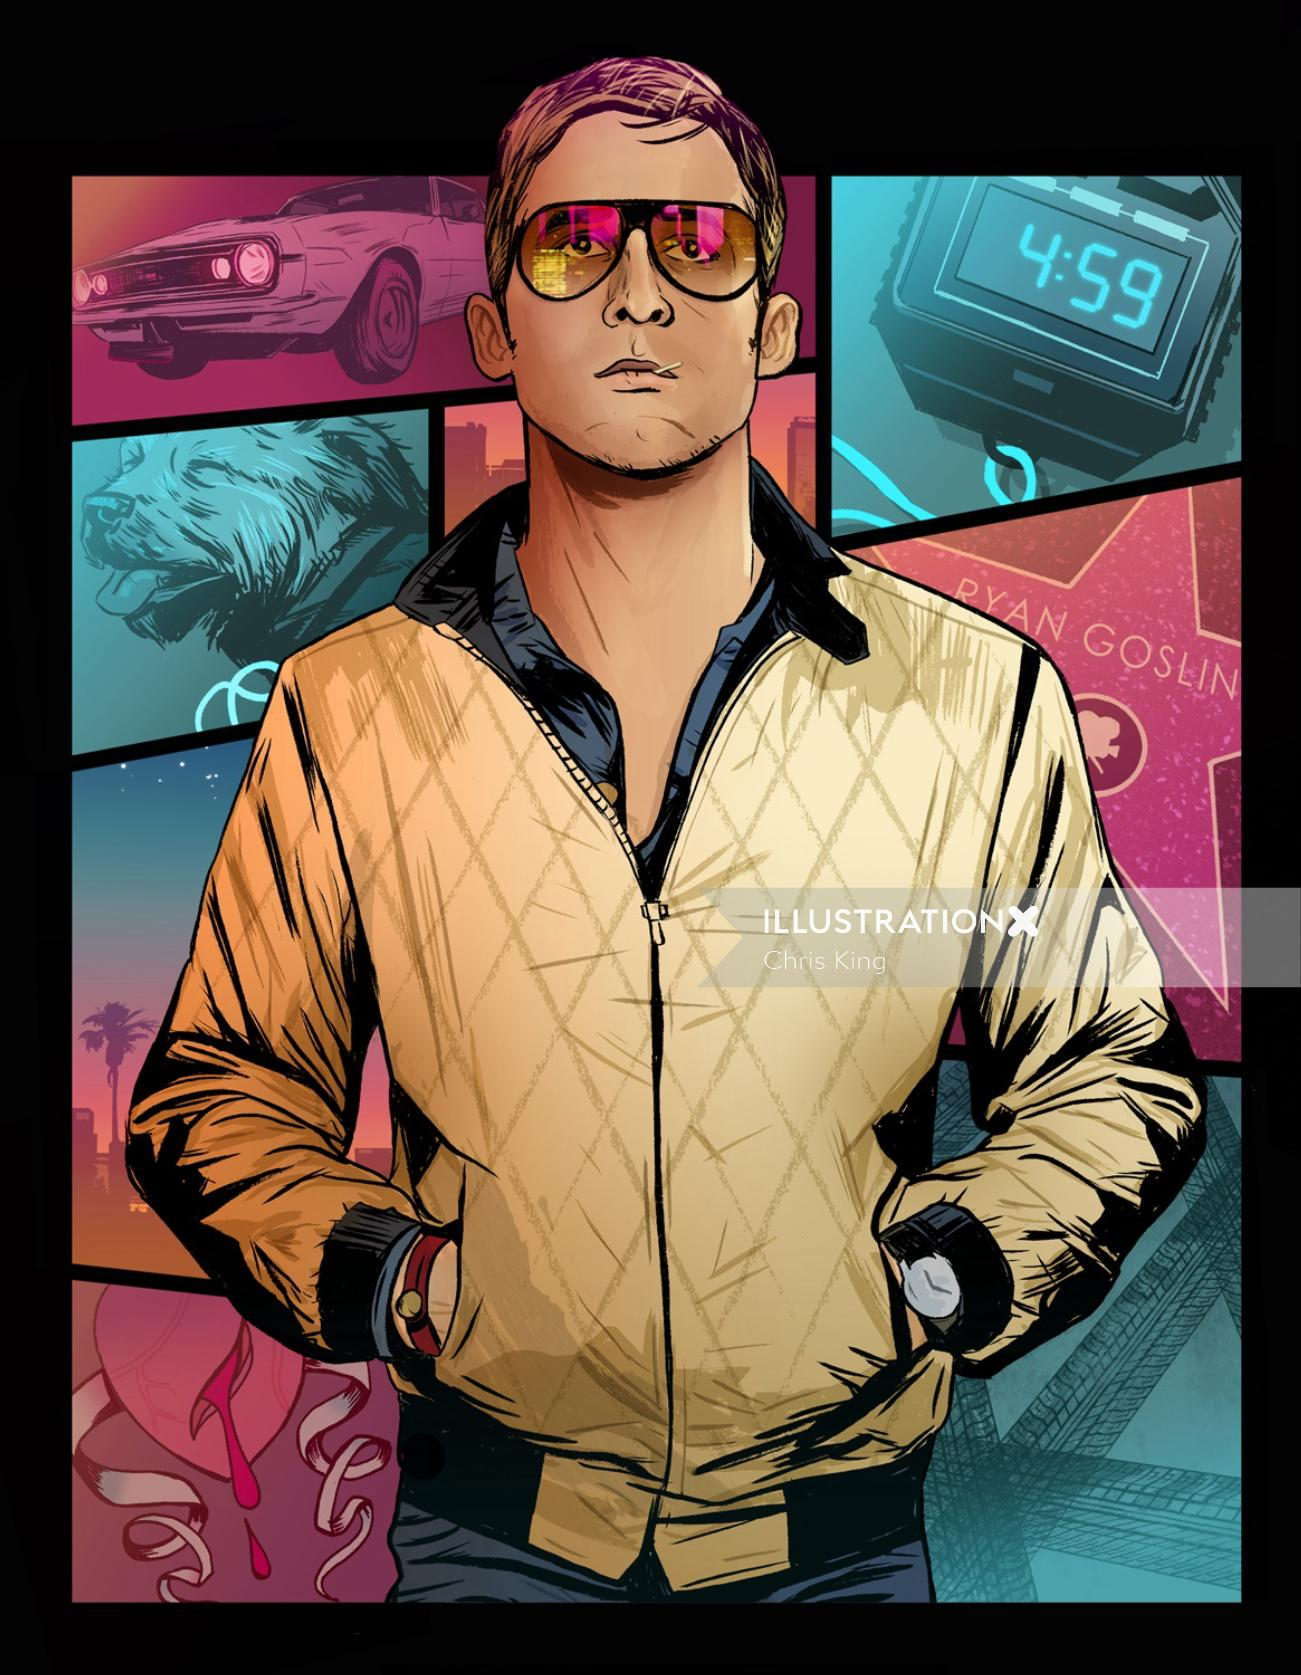 An illustration of Ryan Gosling